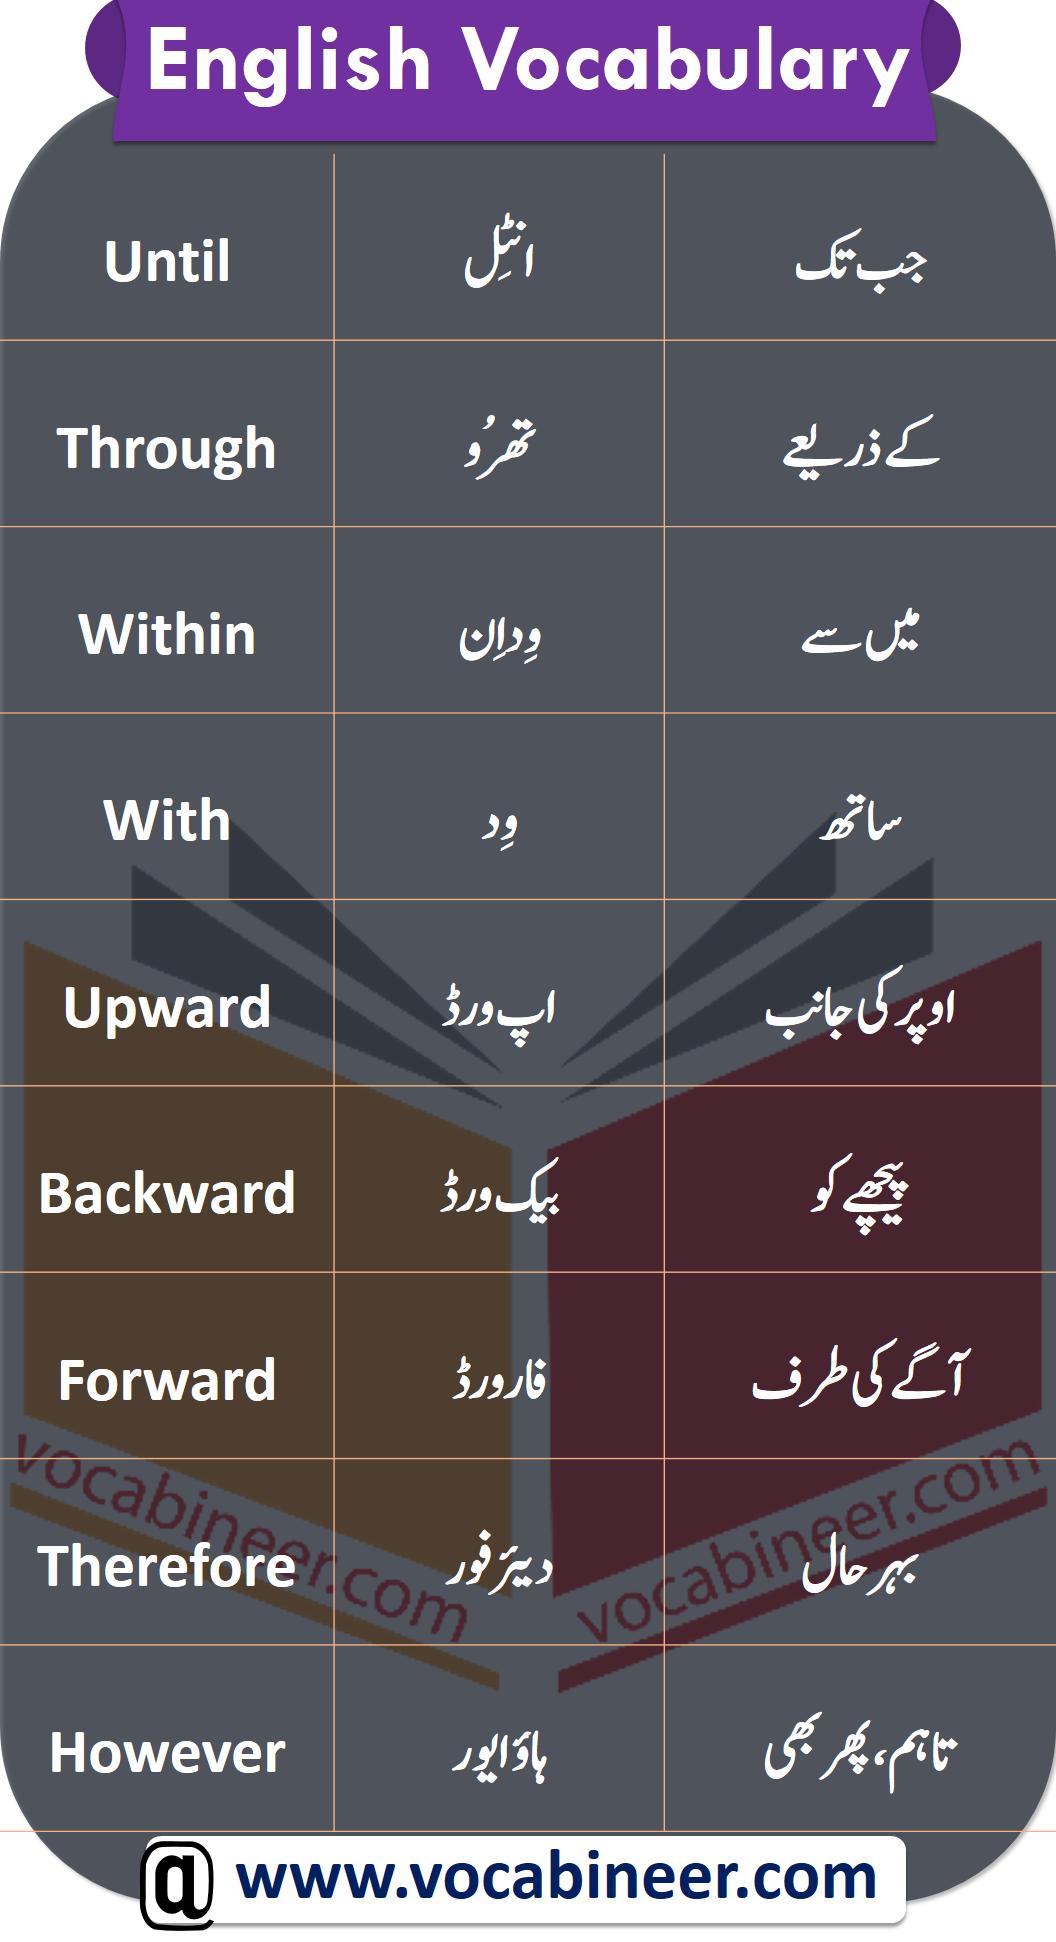 Urdu Words List In English Watch Video Pdf Book In 2020 English Learning Spoken Learn English Words Learn English Vocabulary [ 1942 x 1056 Pixel ]